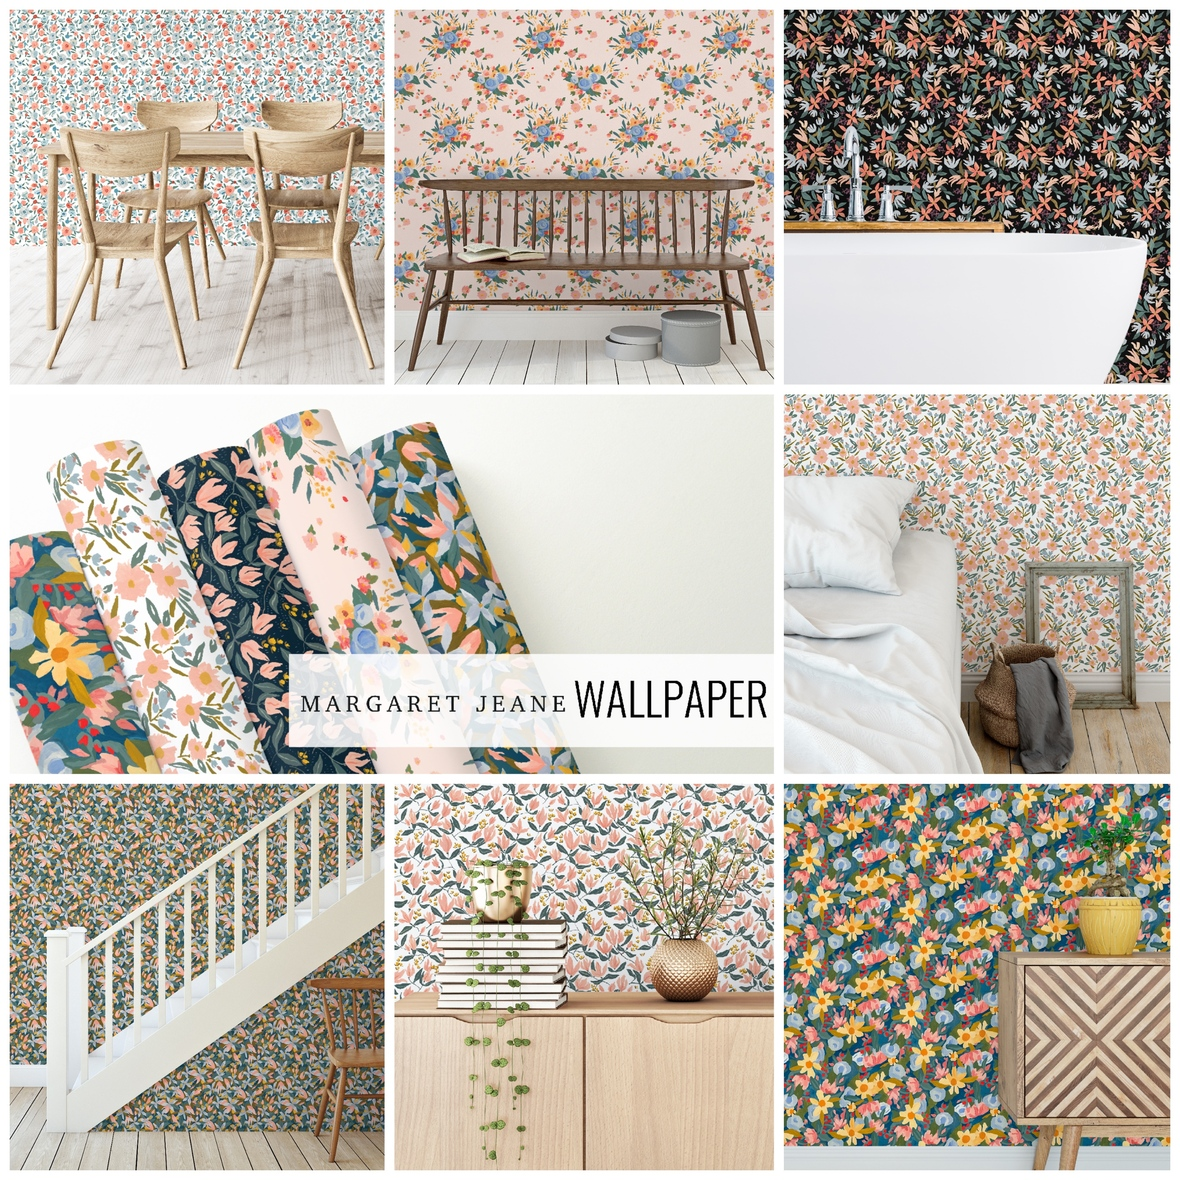 Margaret Jeane Wallpaper at Hawthorne Supply Co